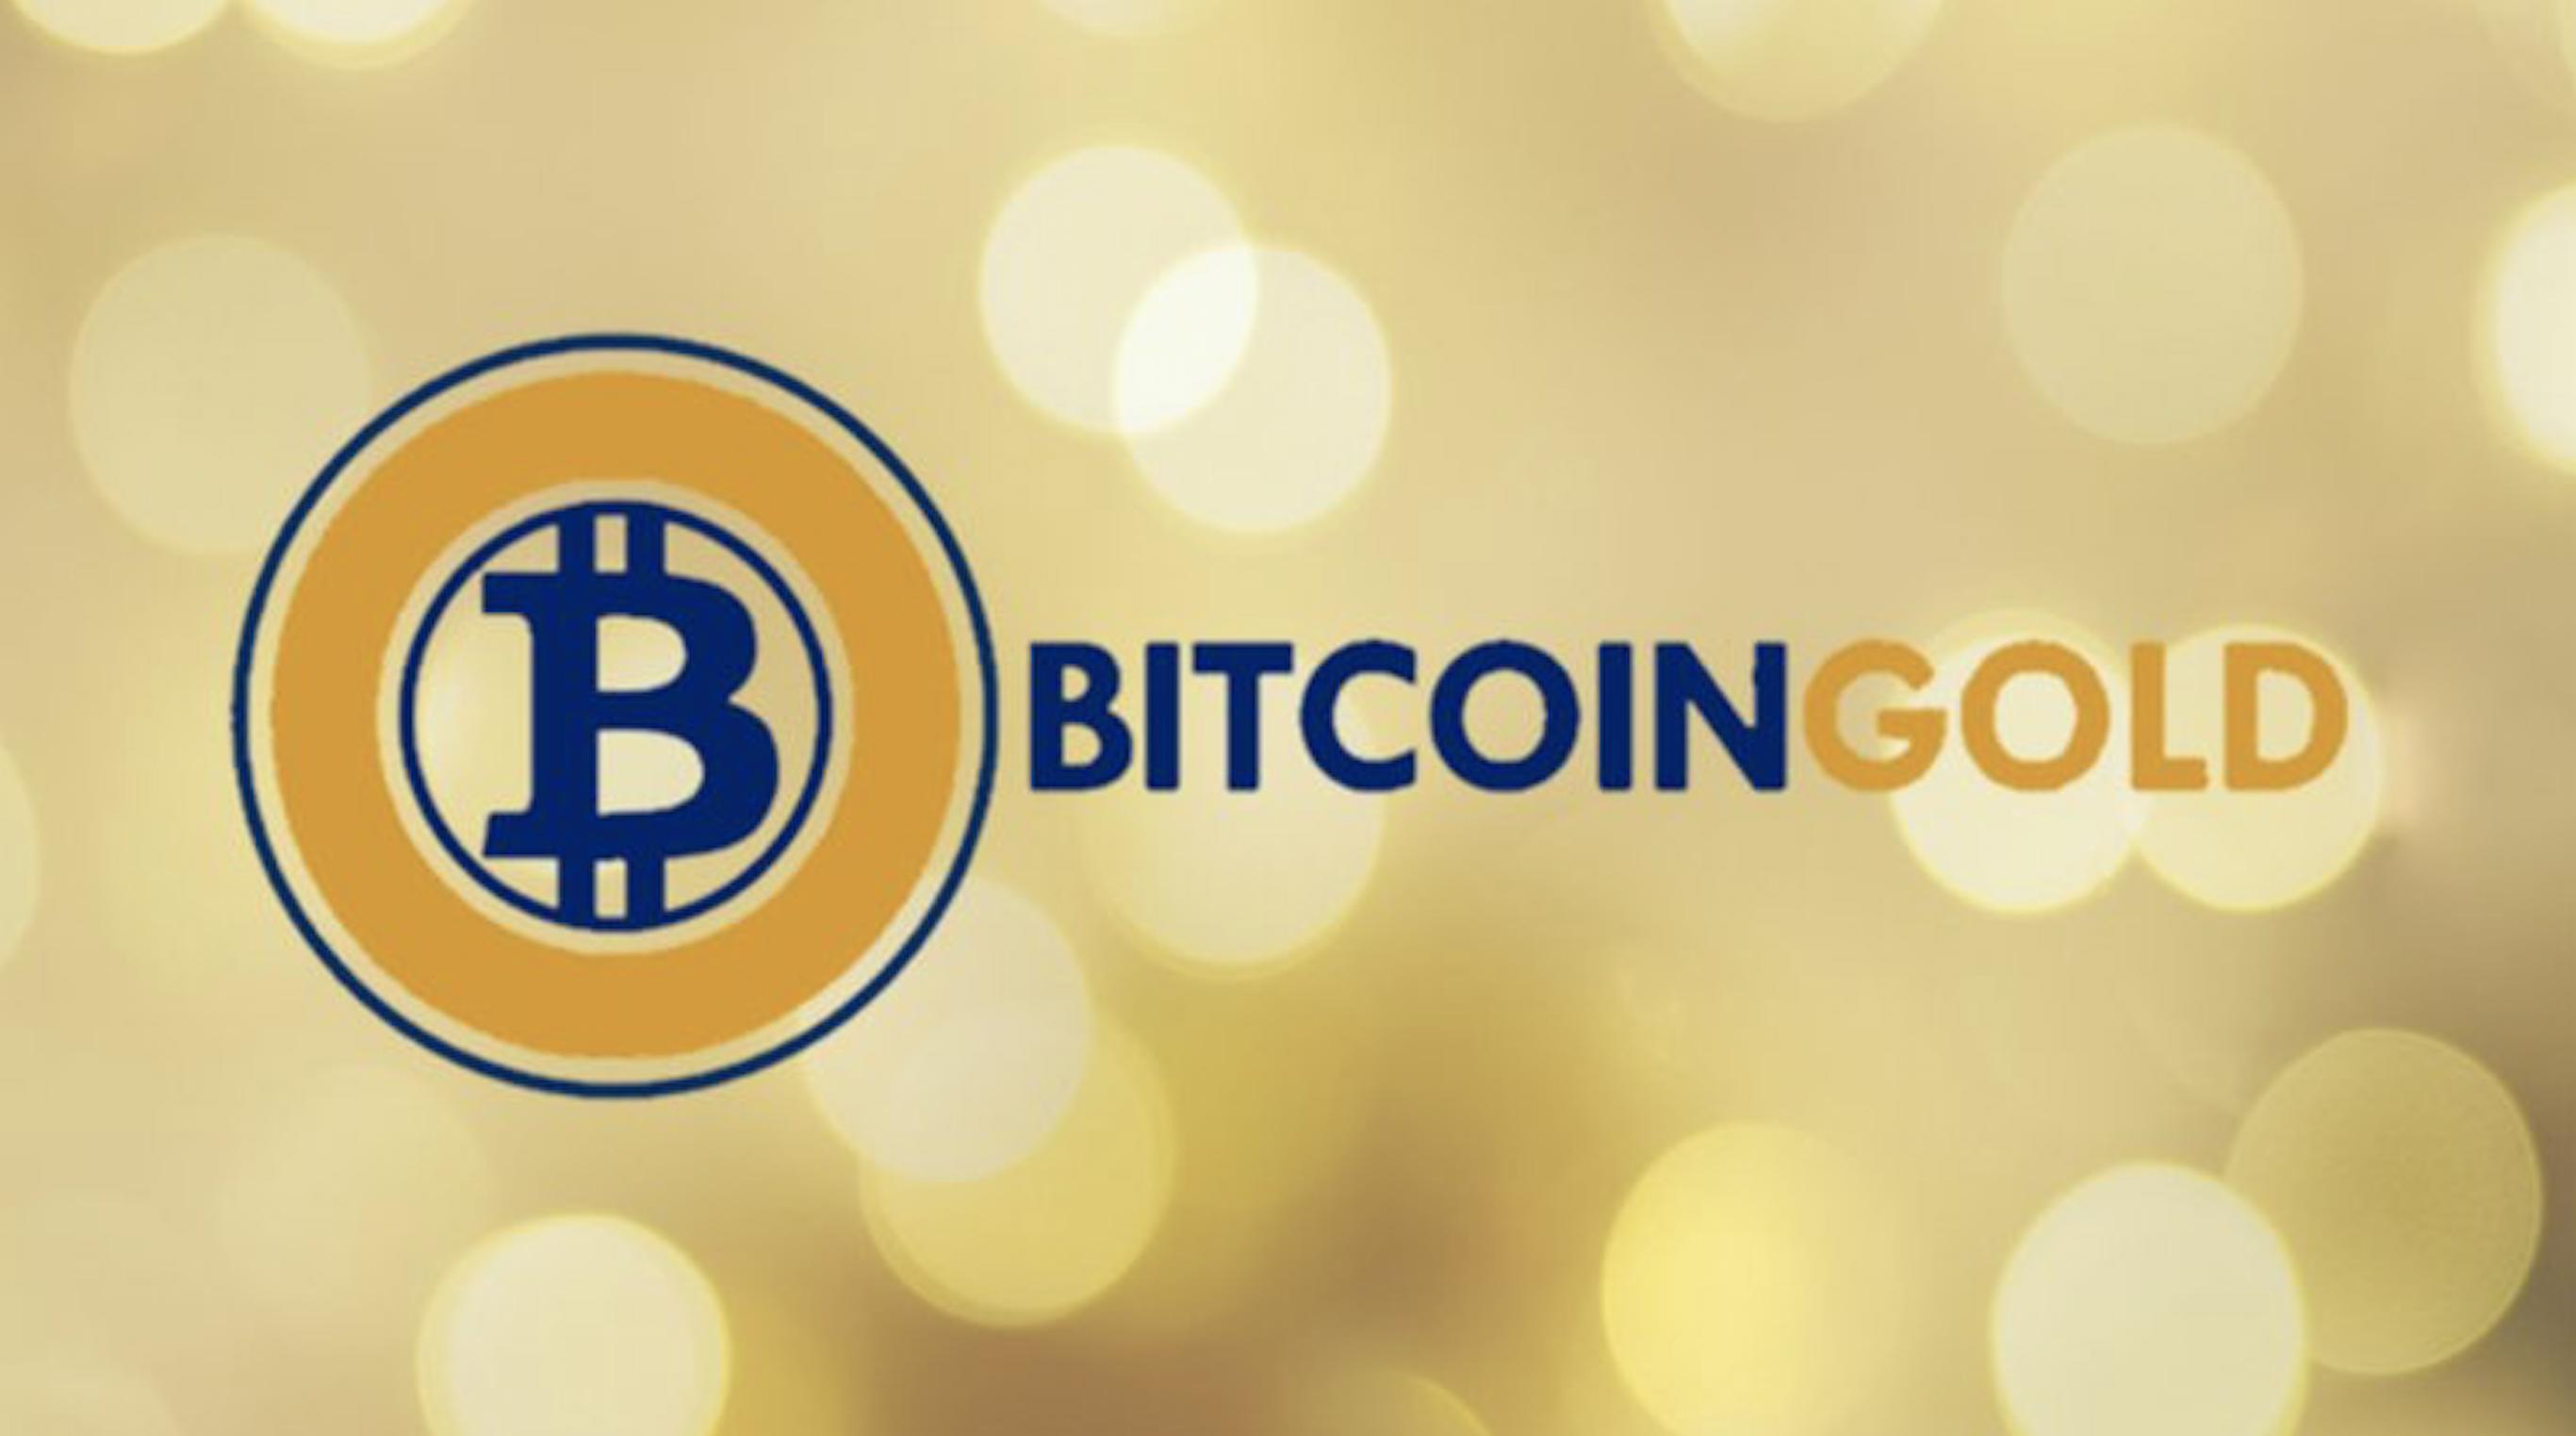 Bitcoin gold pool github : Star coin guide gw2